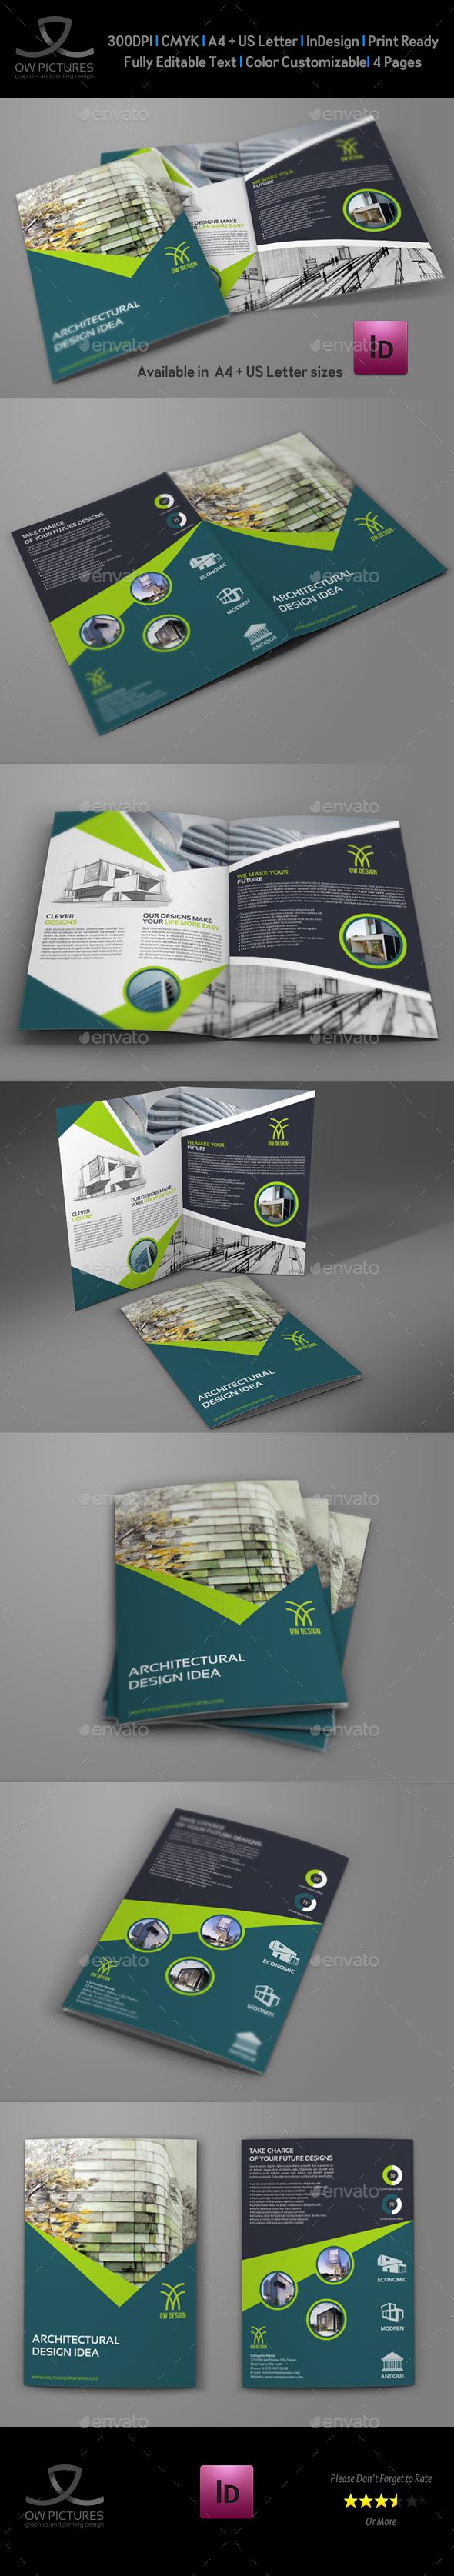 Architectural Design Bi-Fold Brochure Template - Brochures Print Templates